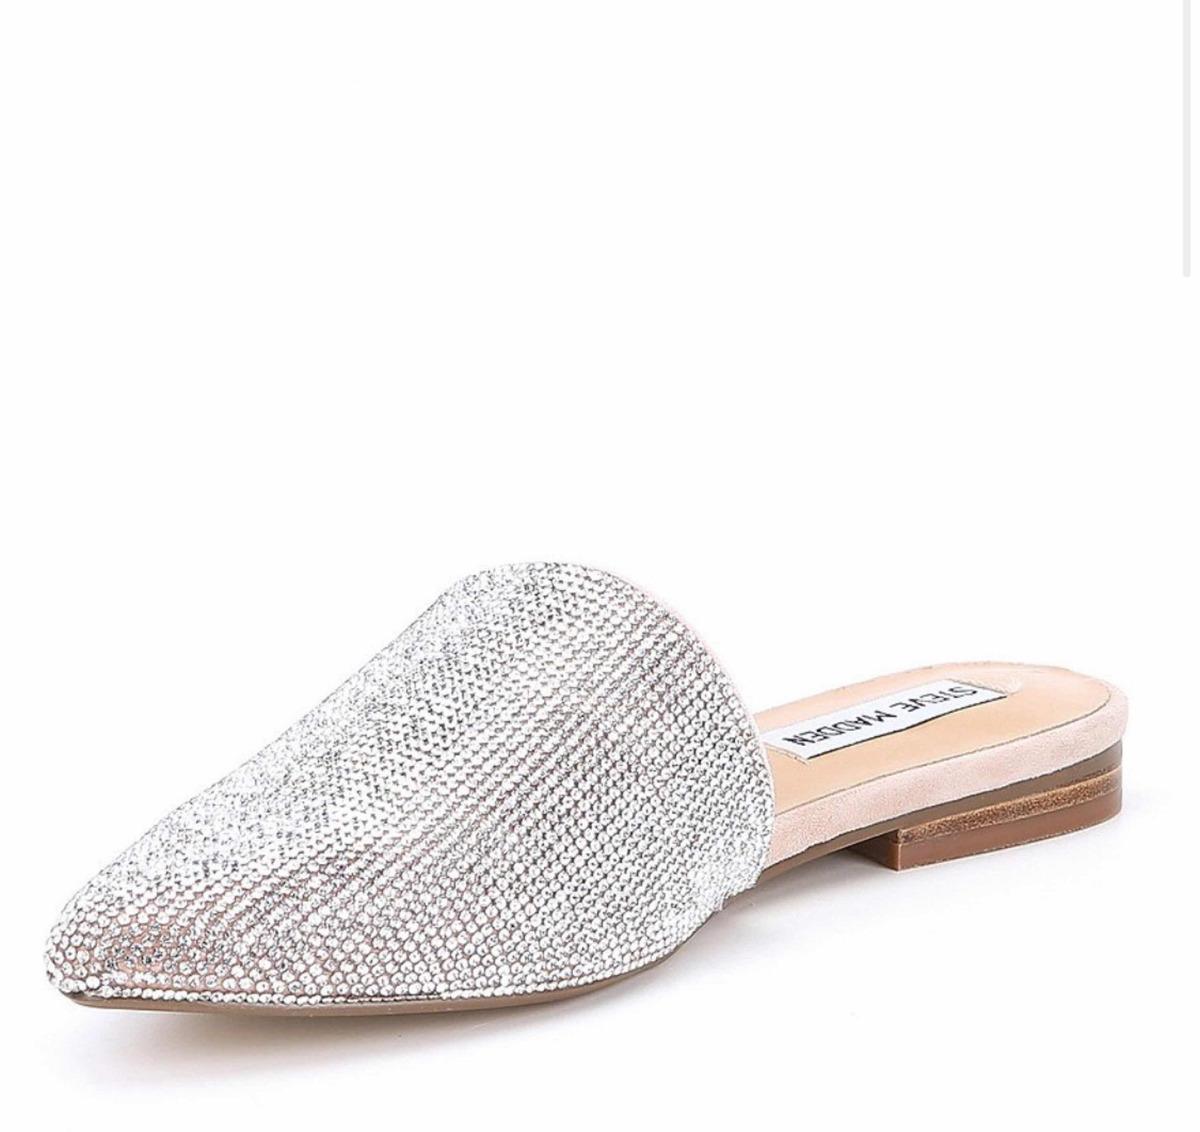 87d76e17c85 Zapatos Steve Madden Trace-r Rhinestone 25cm Único Par